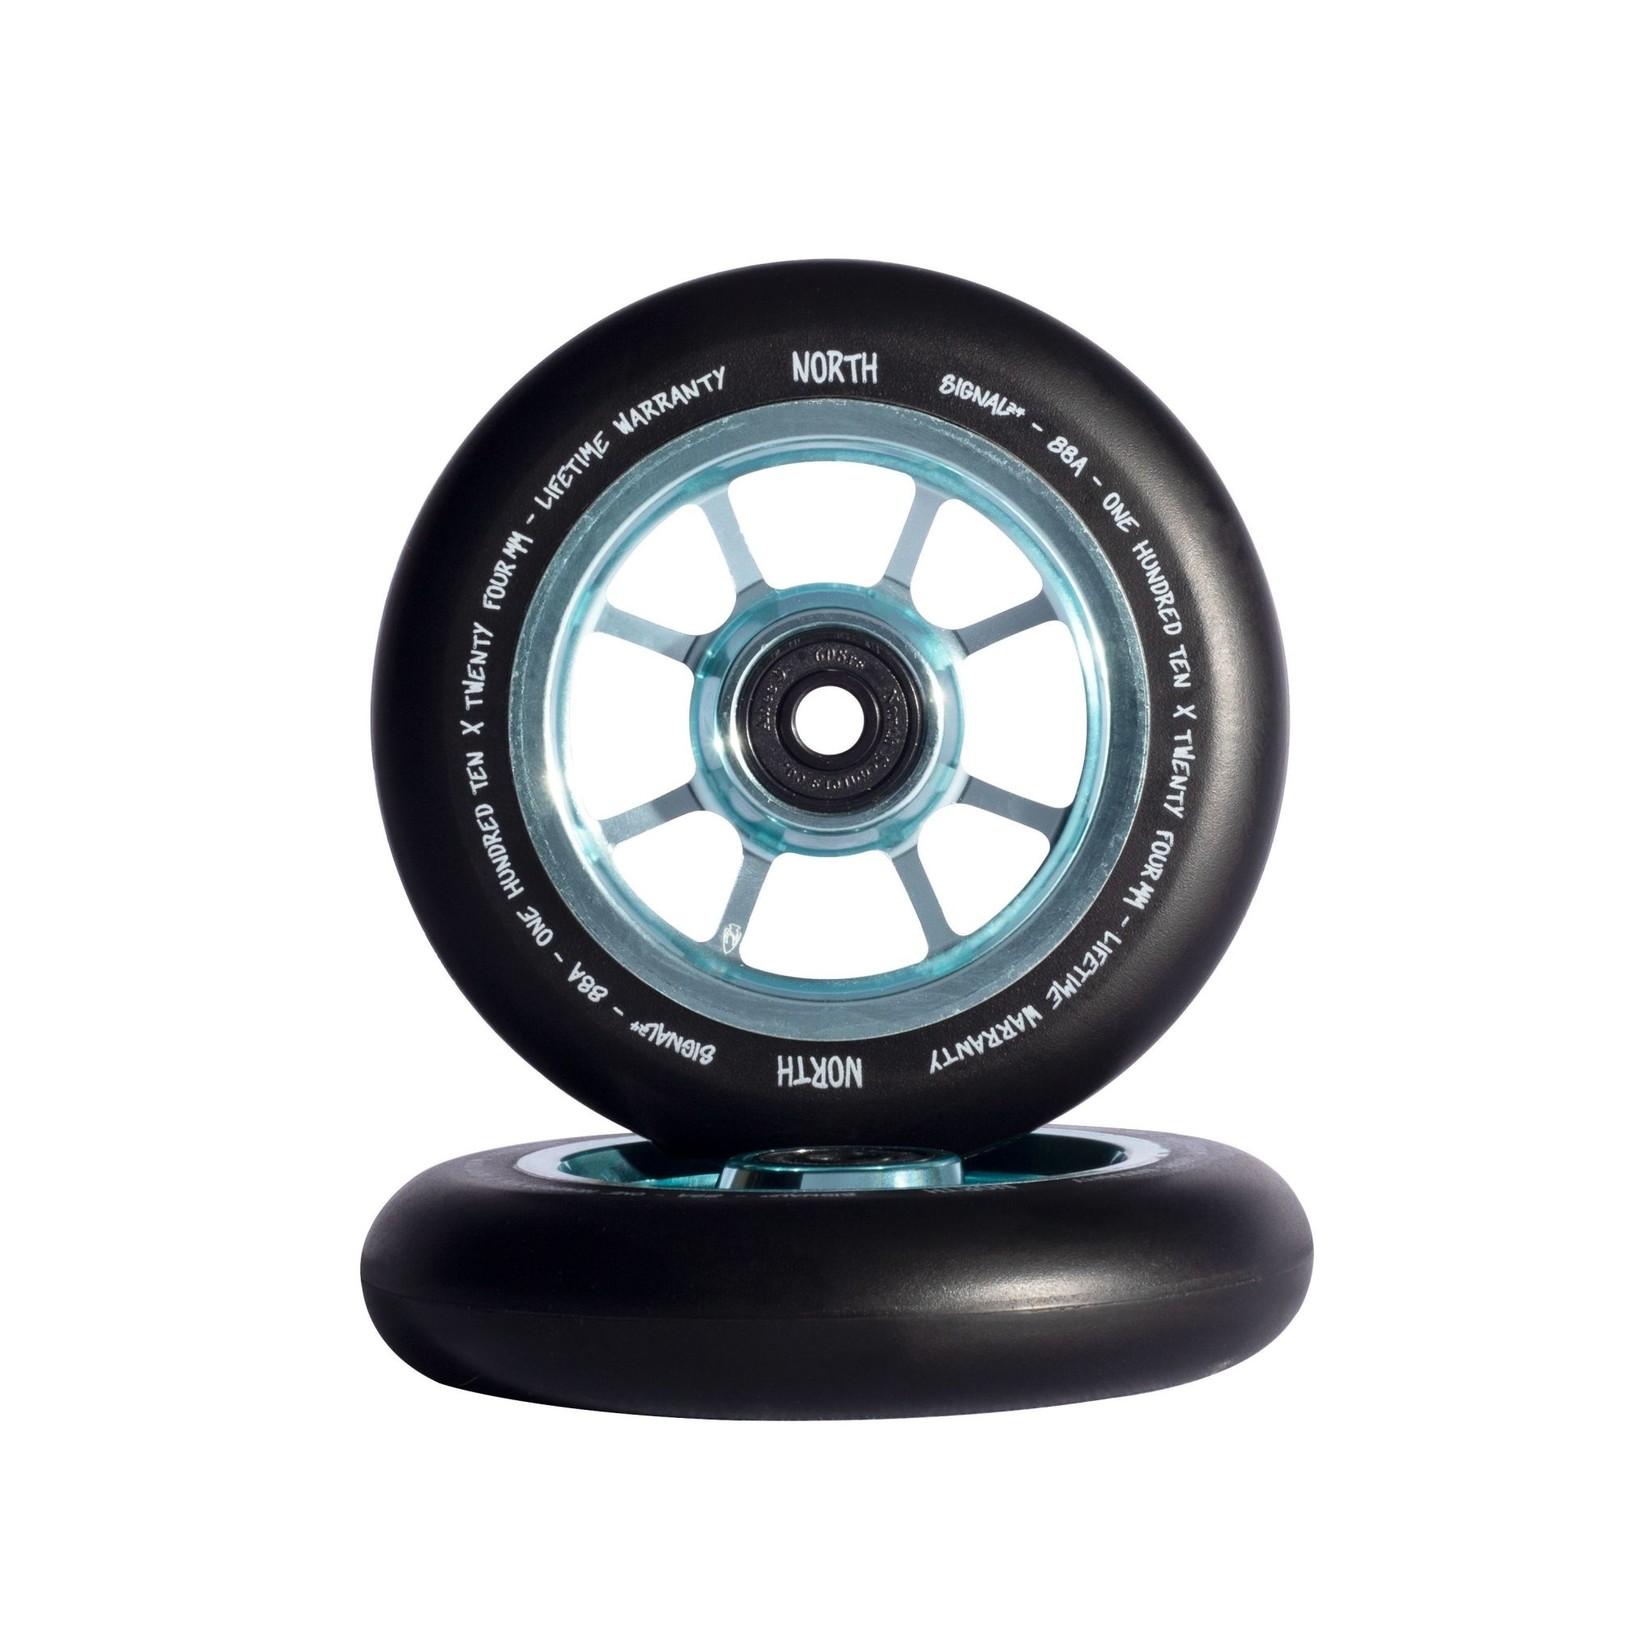 North North - Signal Wheels - 110 x 24mm - Black / Jade